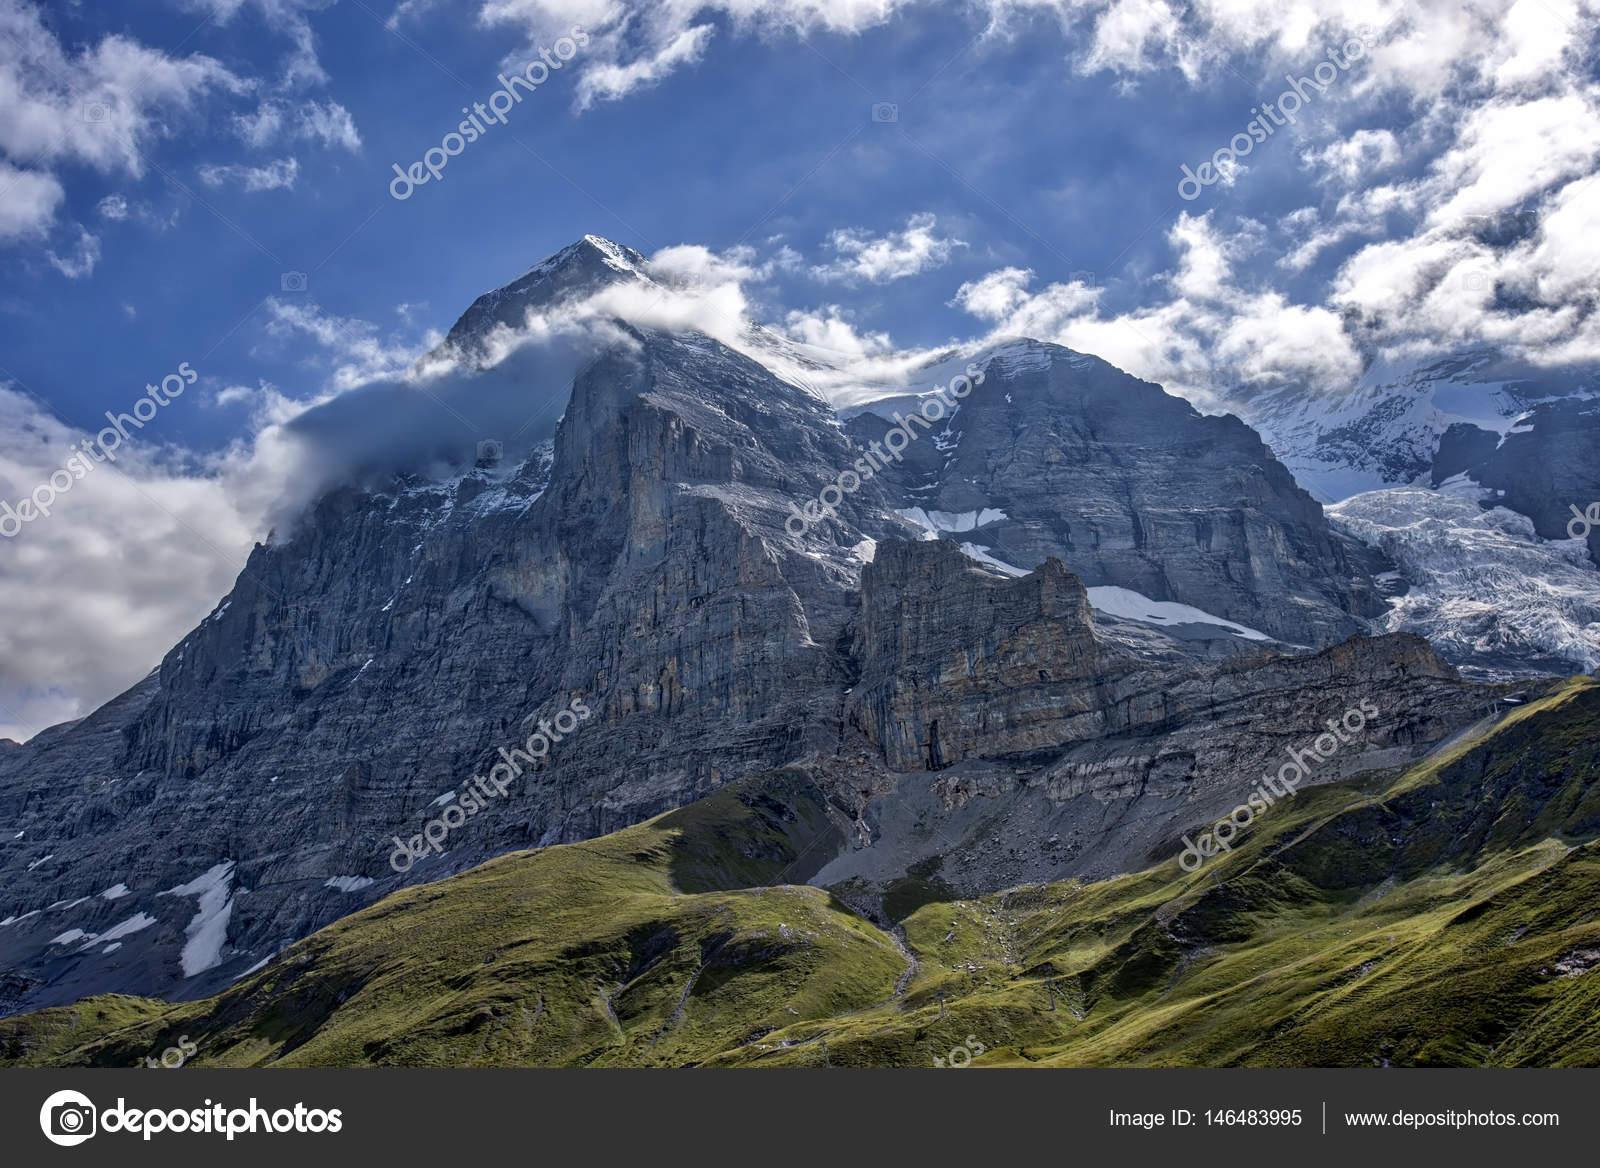 Eiger em bernese oberland stock photo rb3legs 146483995 eiger em bernese oberland fotografia de stock reheart Choice Image